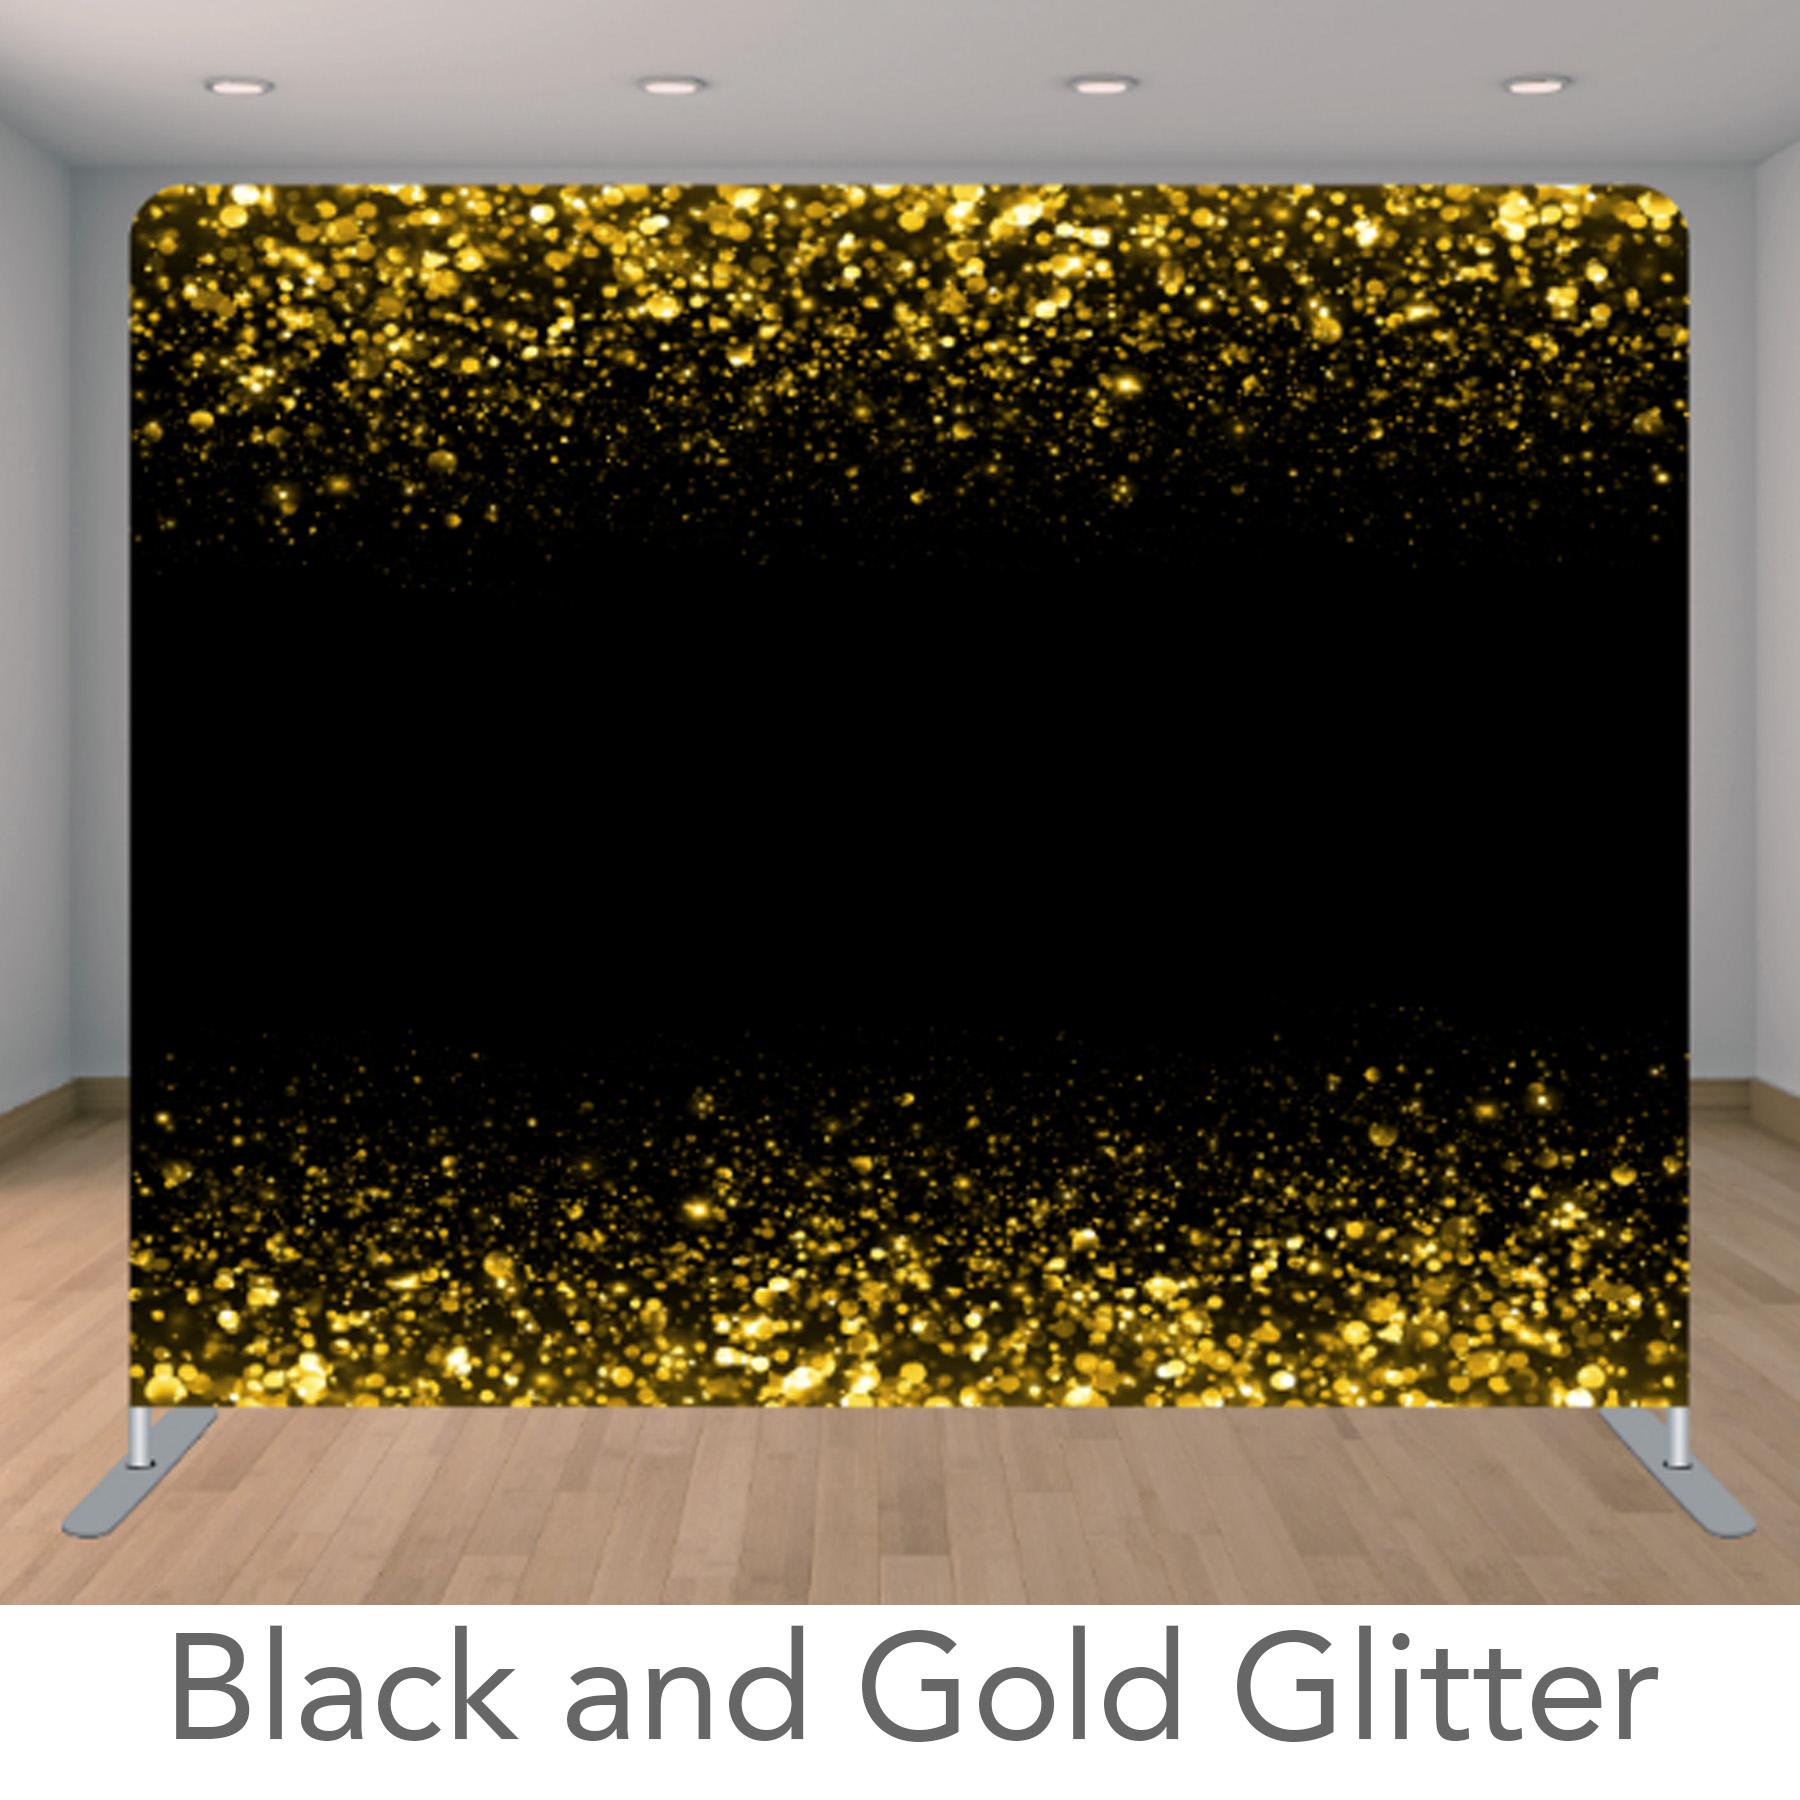 BlackandGoldGlitter.jpg